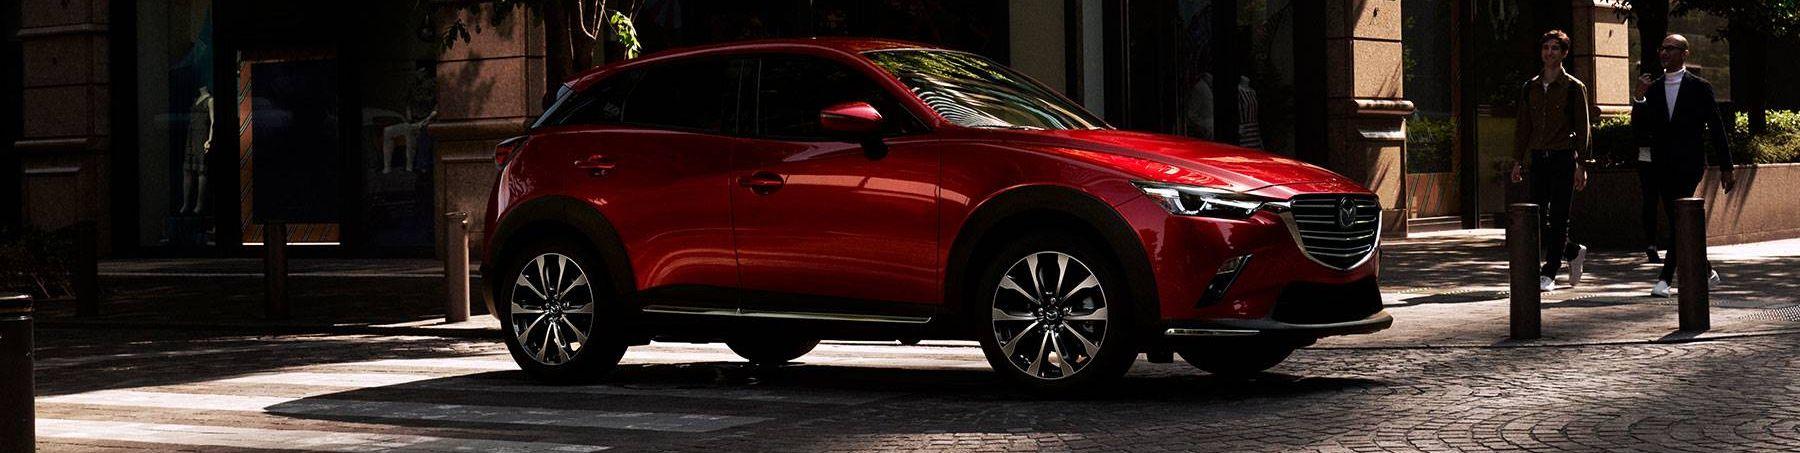 2019 Mazda CX-3 for Sale near New Braunfels, TX